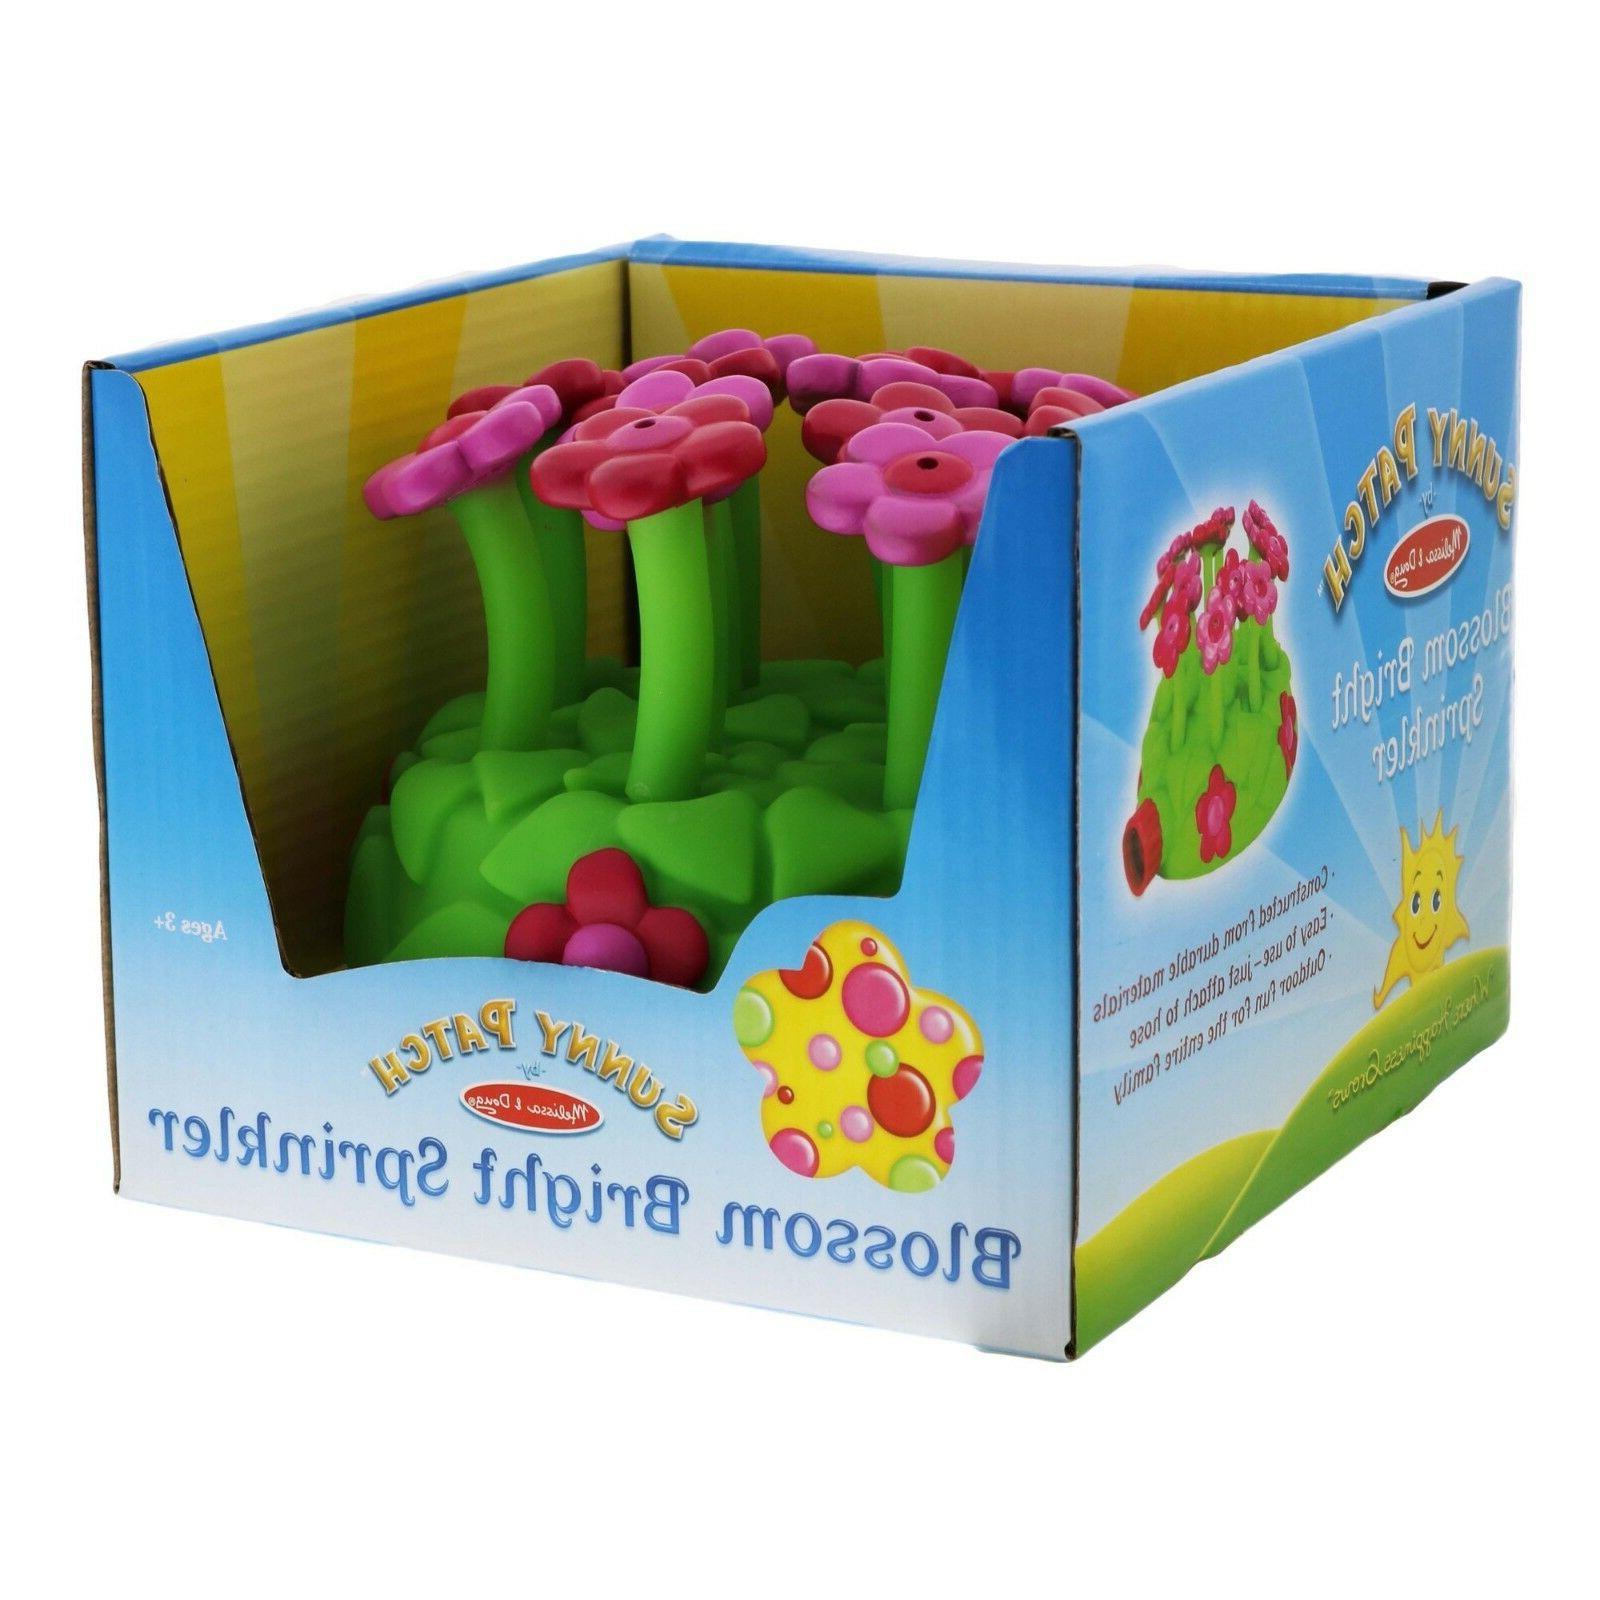 blossom bright sprinkler melissa and doug toy